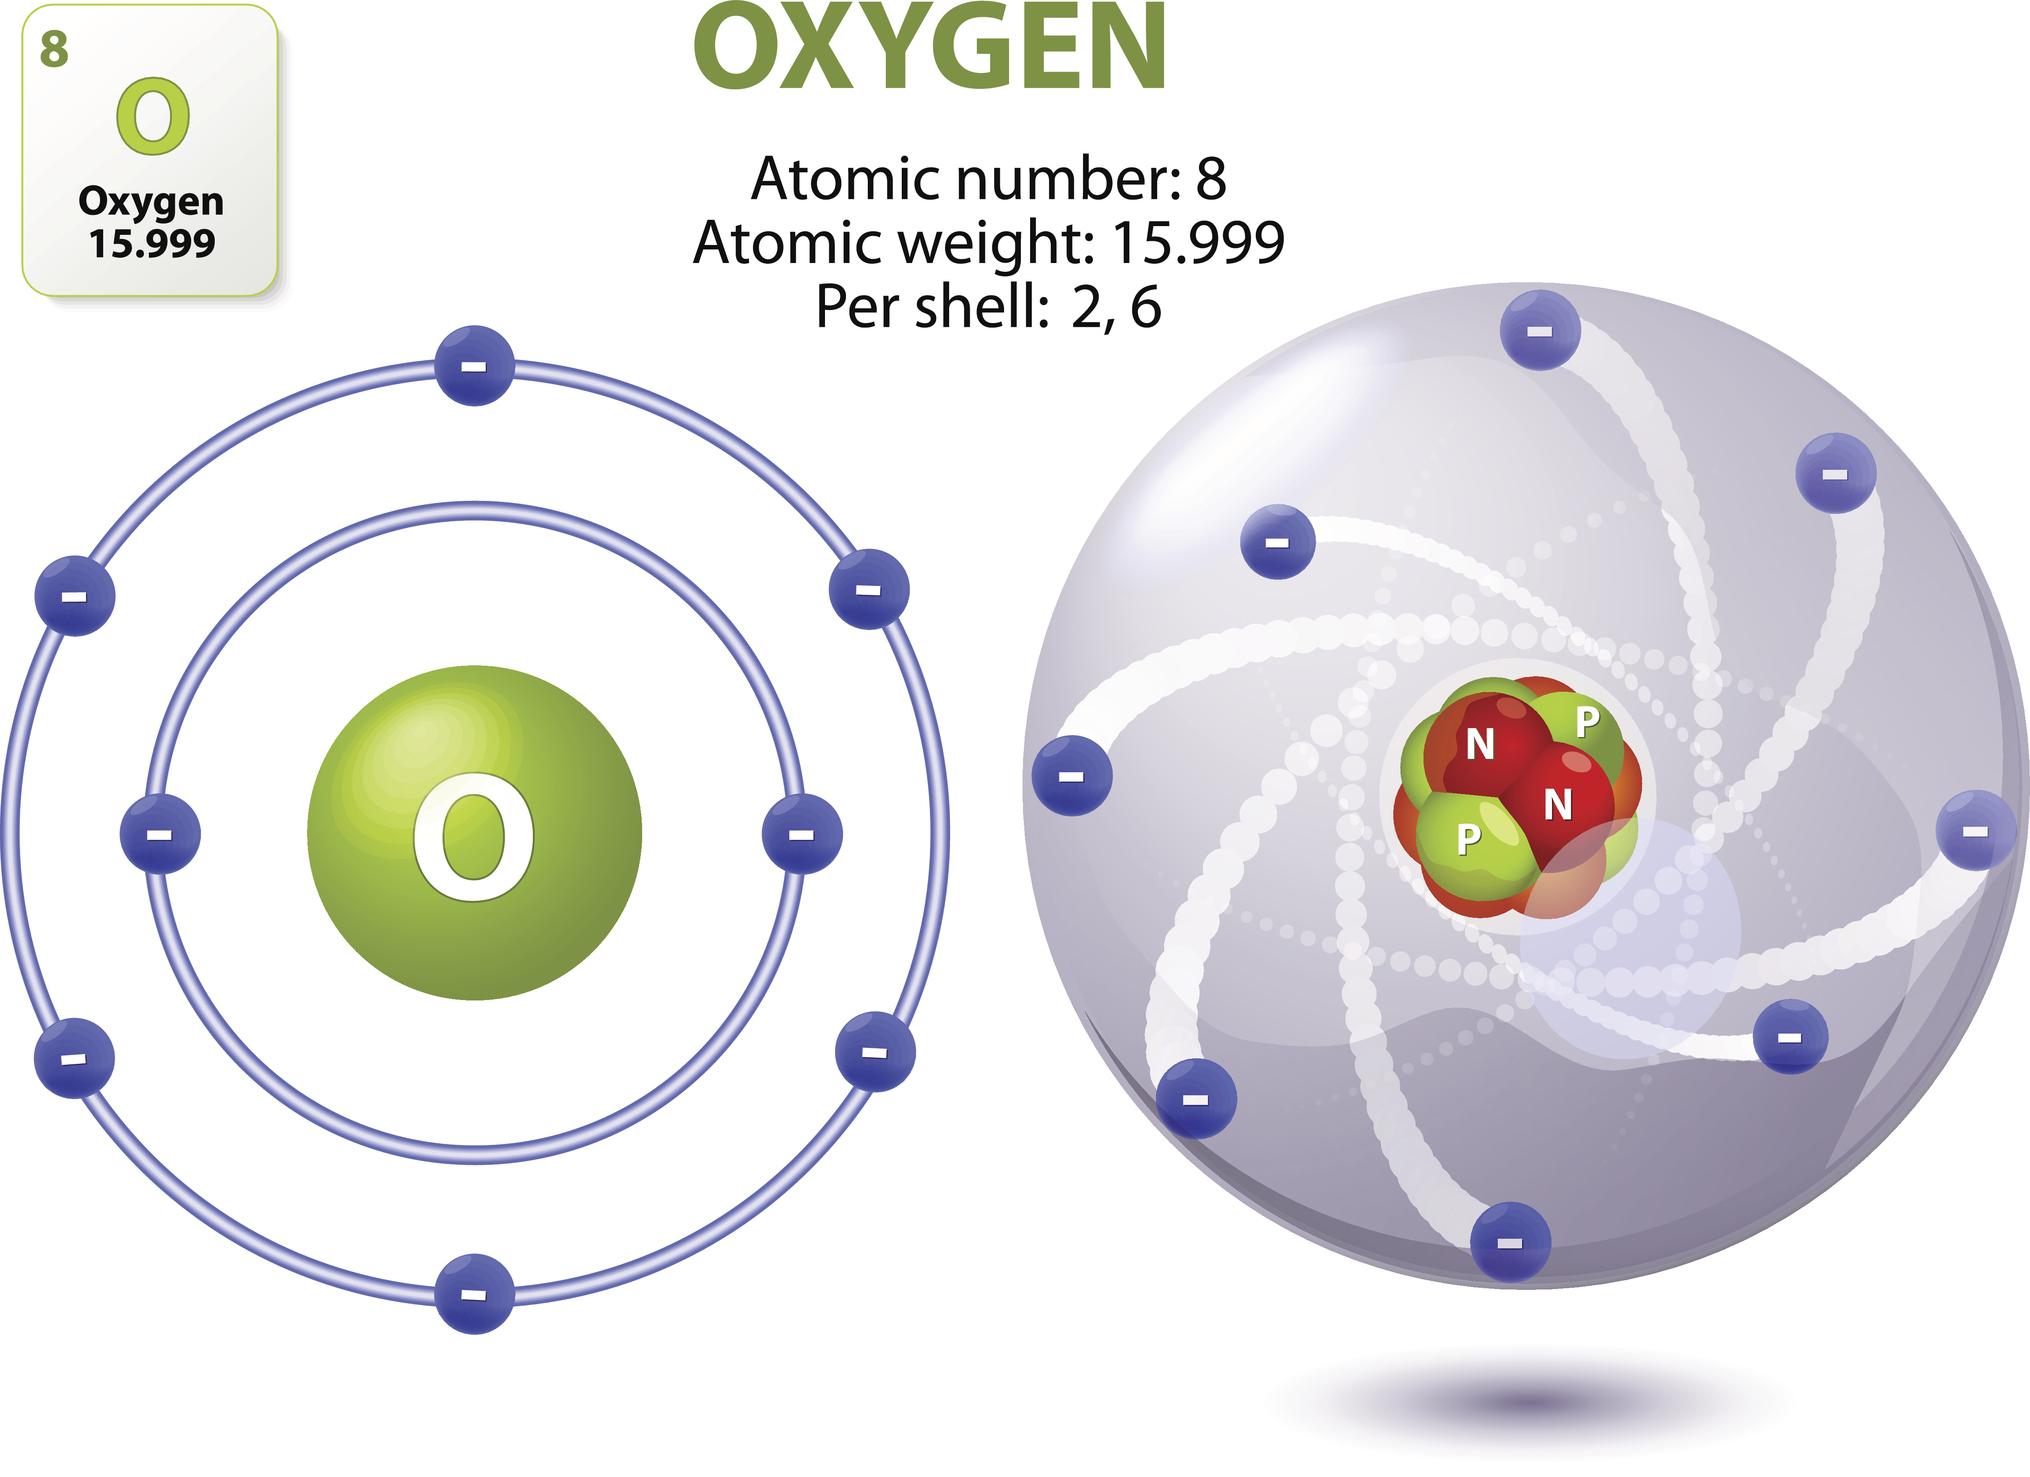 Oxygen atom image